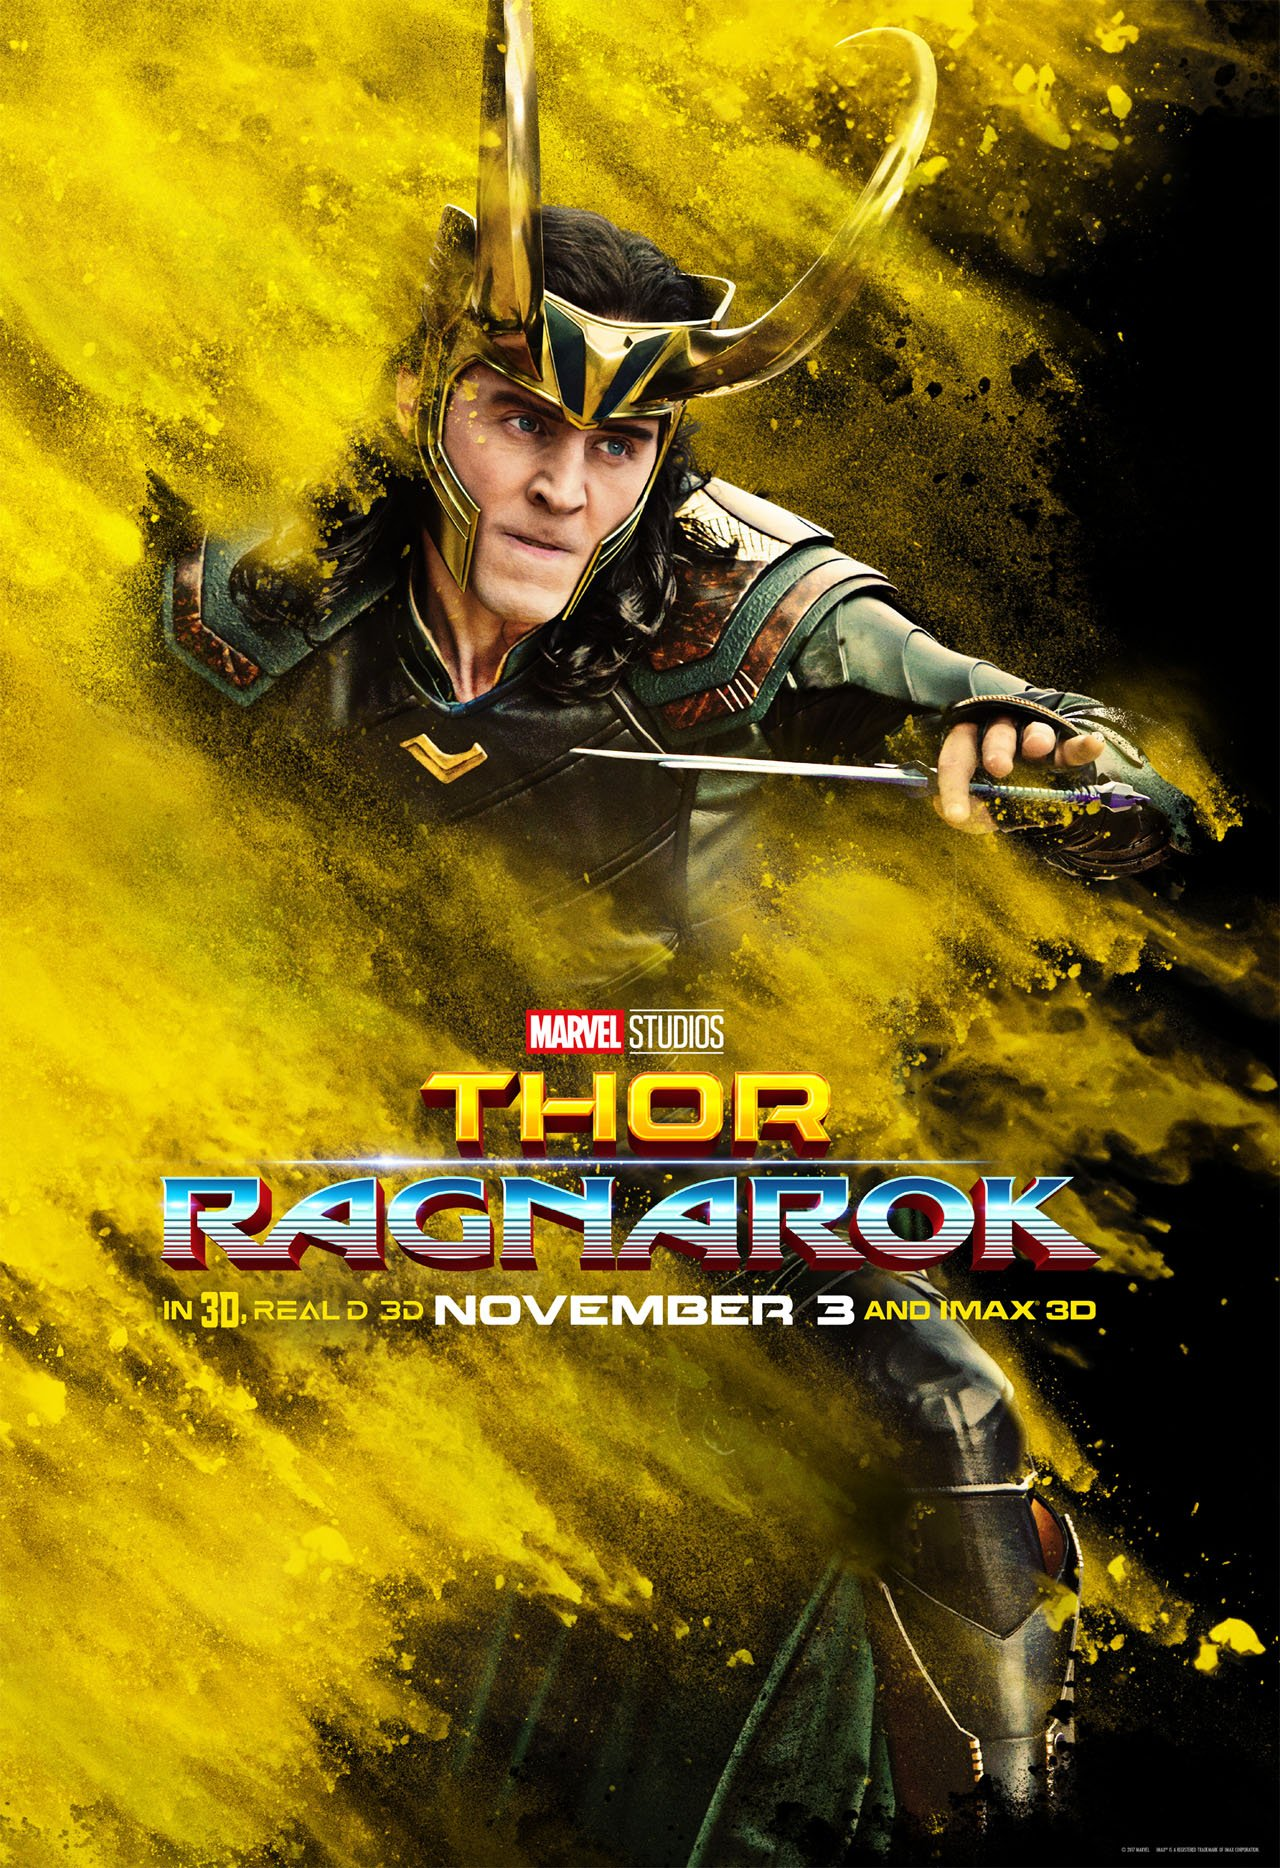 Thor: Ragnarok – recenzja spoilerowa - naEKRANIE pl